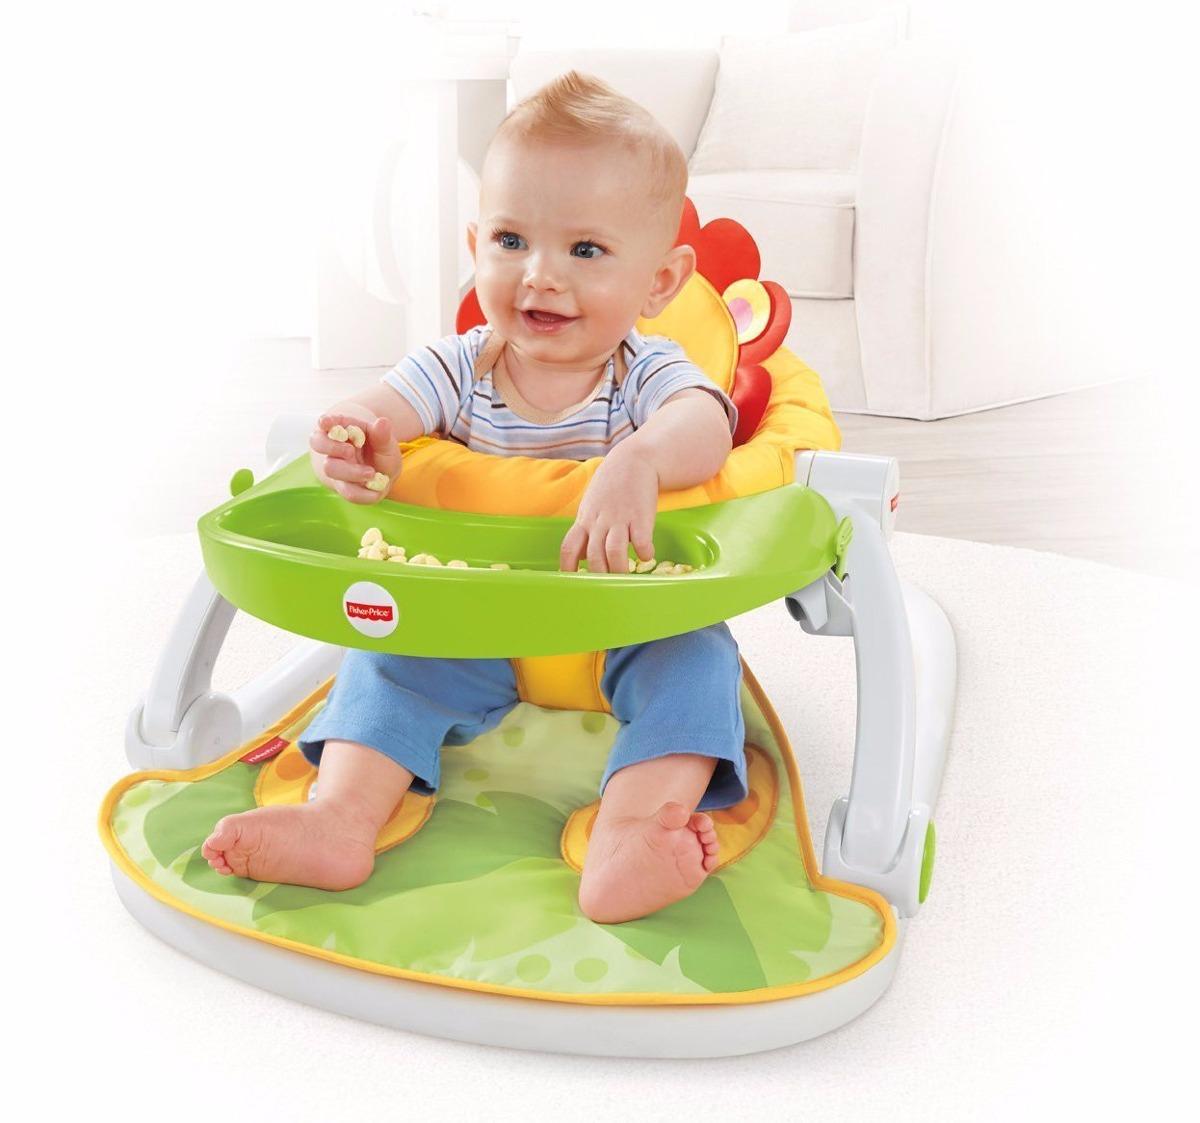 Fisher price sit me up silla portatil sillita con juguetes for Silla 2 en 1 fisher price